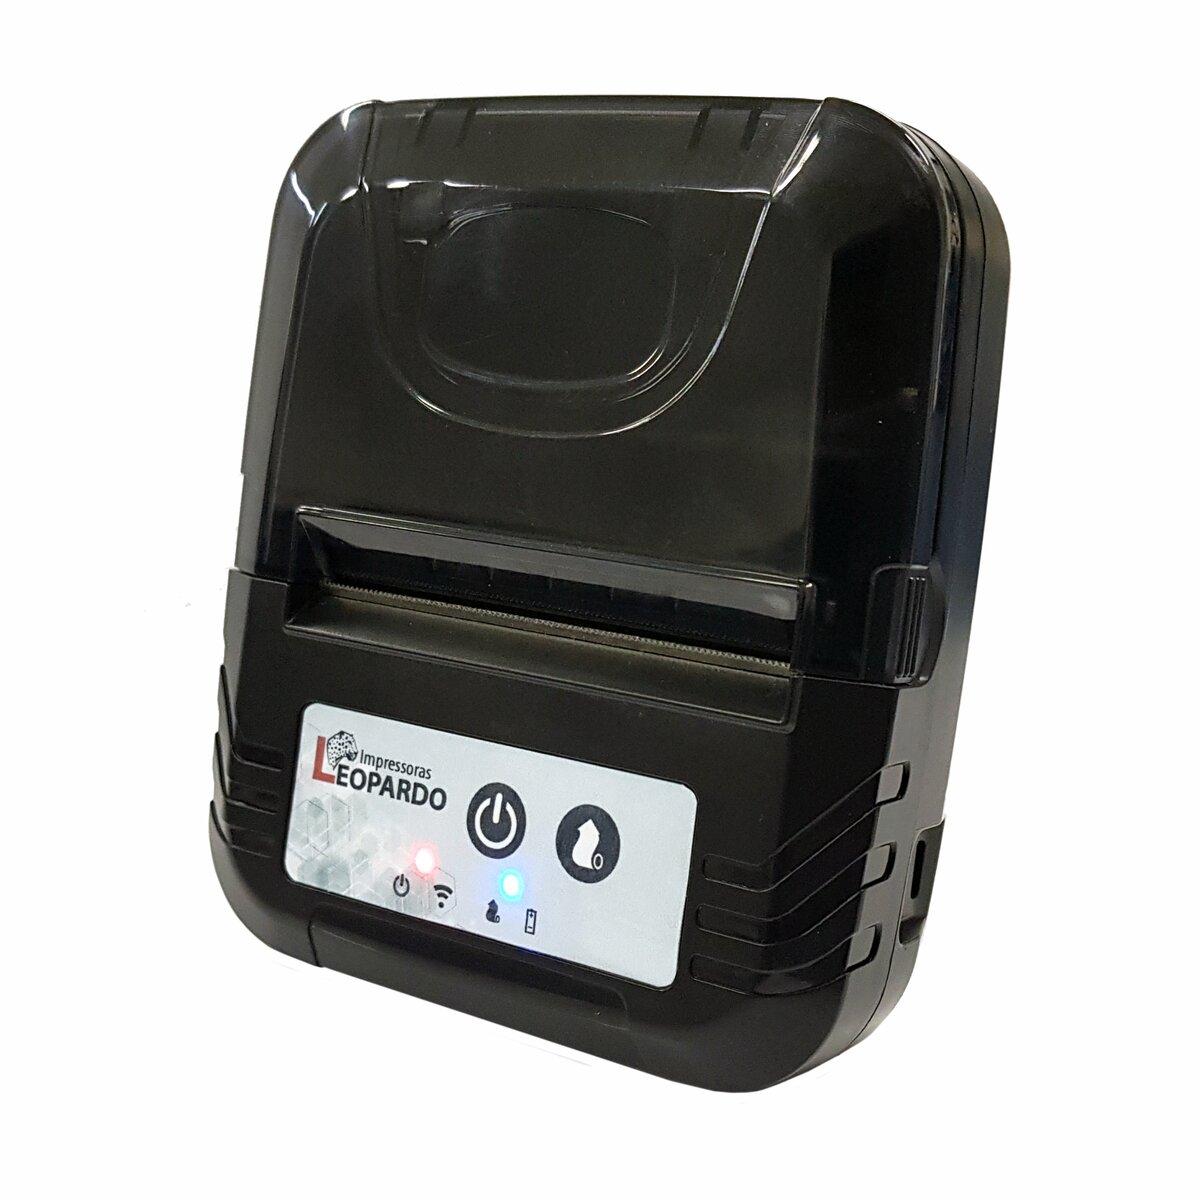 Impressora Térmica Portátil 80mm Leopardo X - InputService